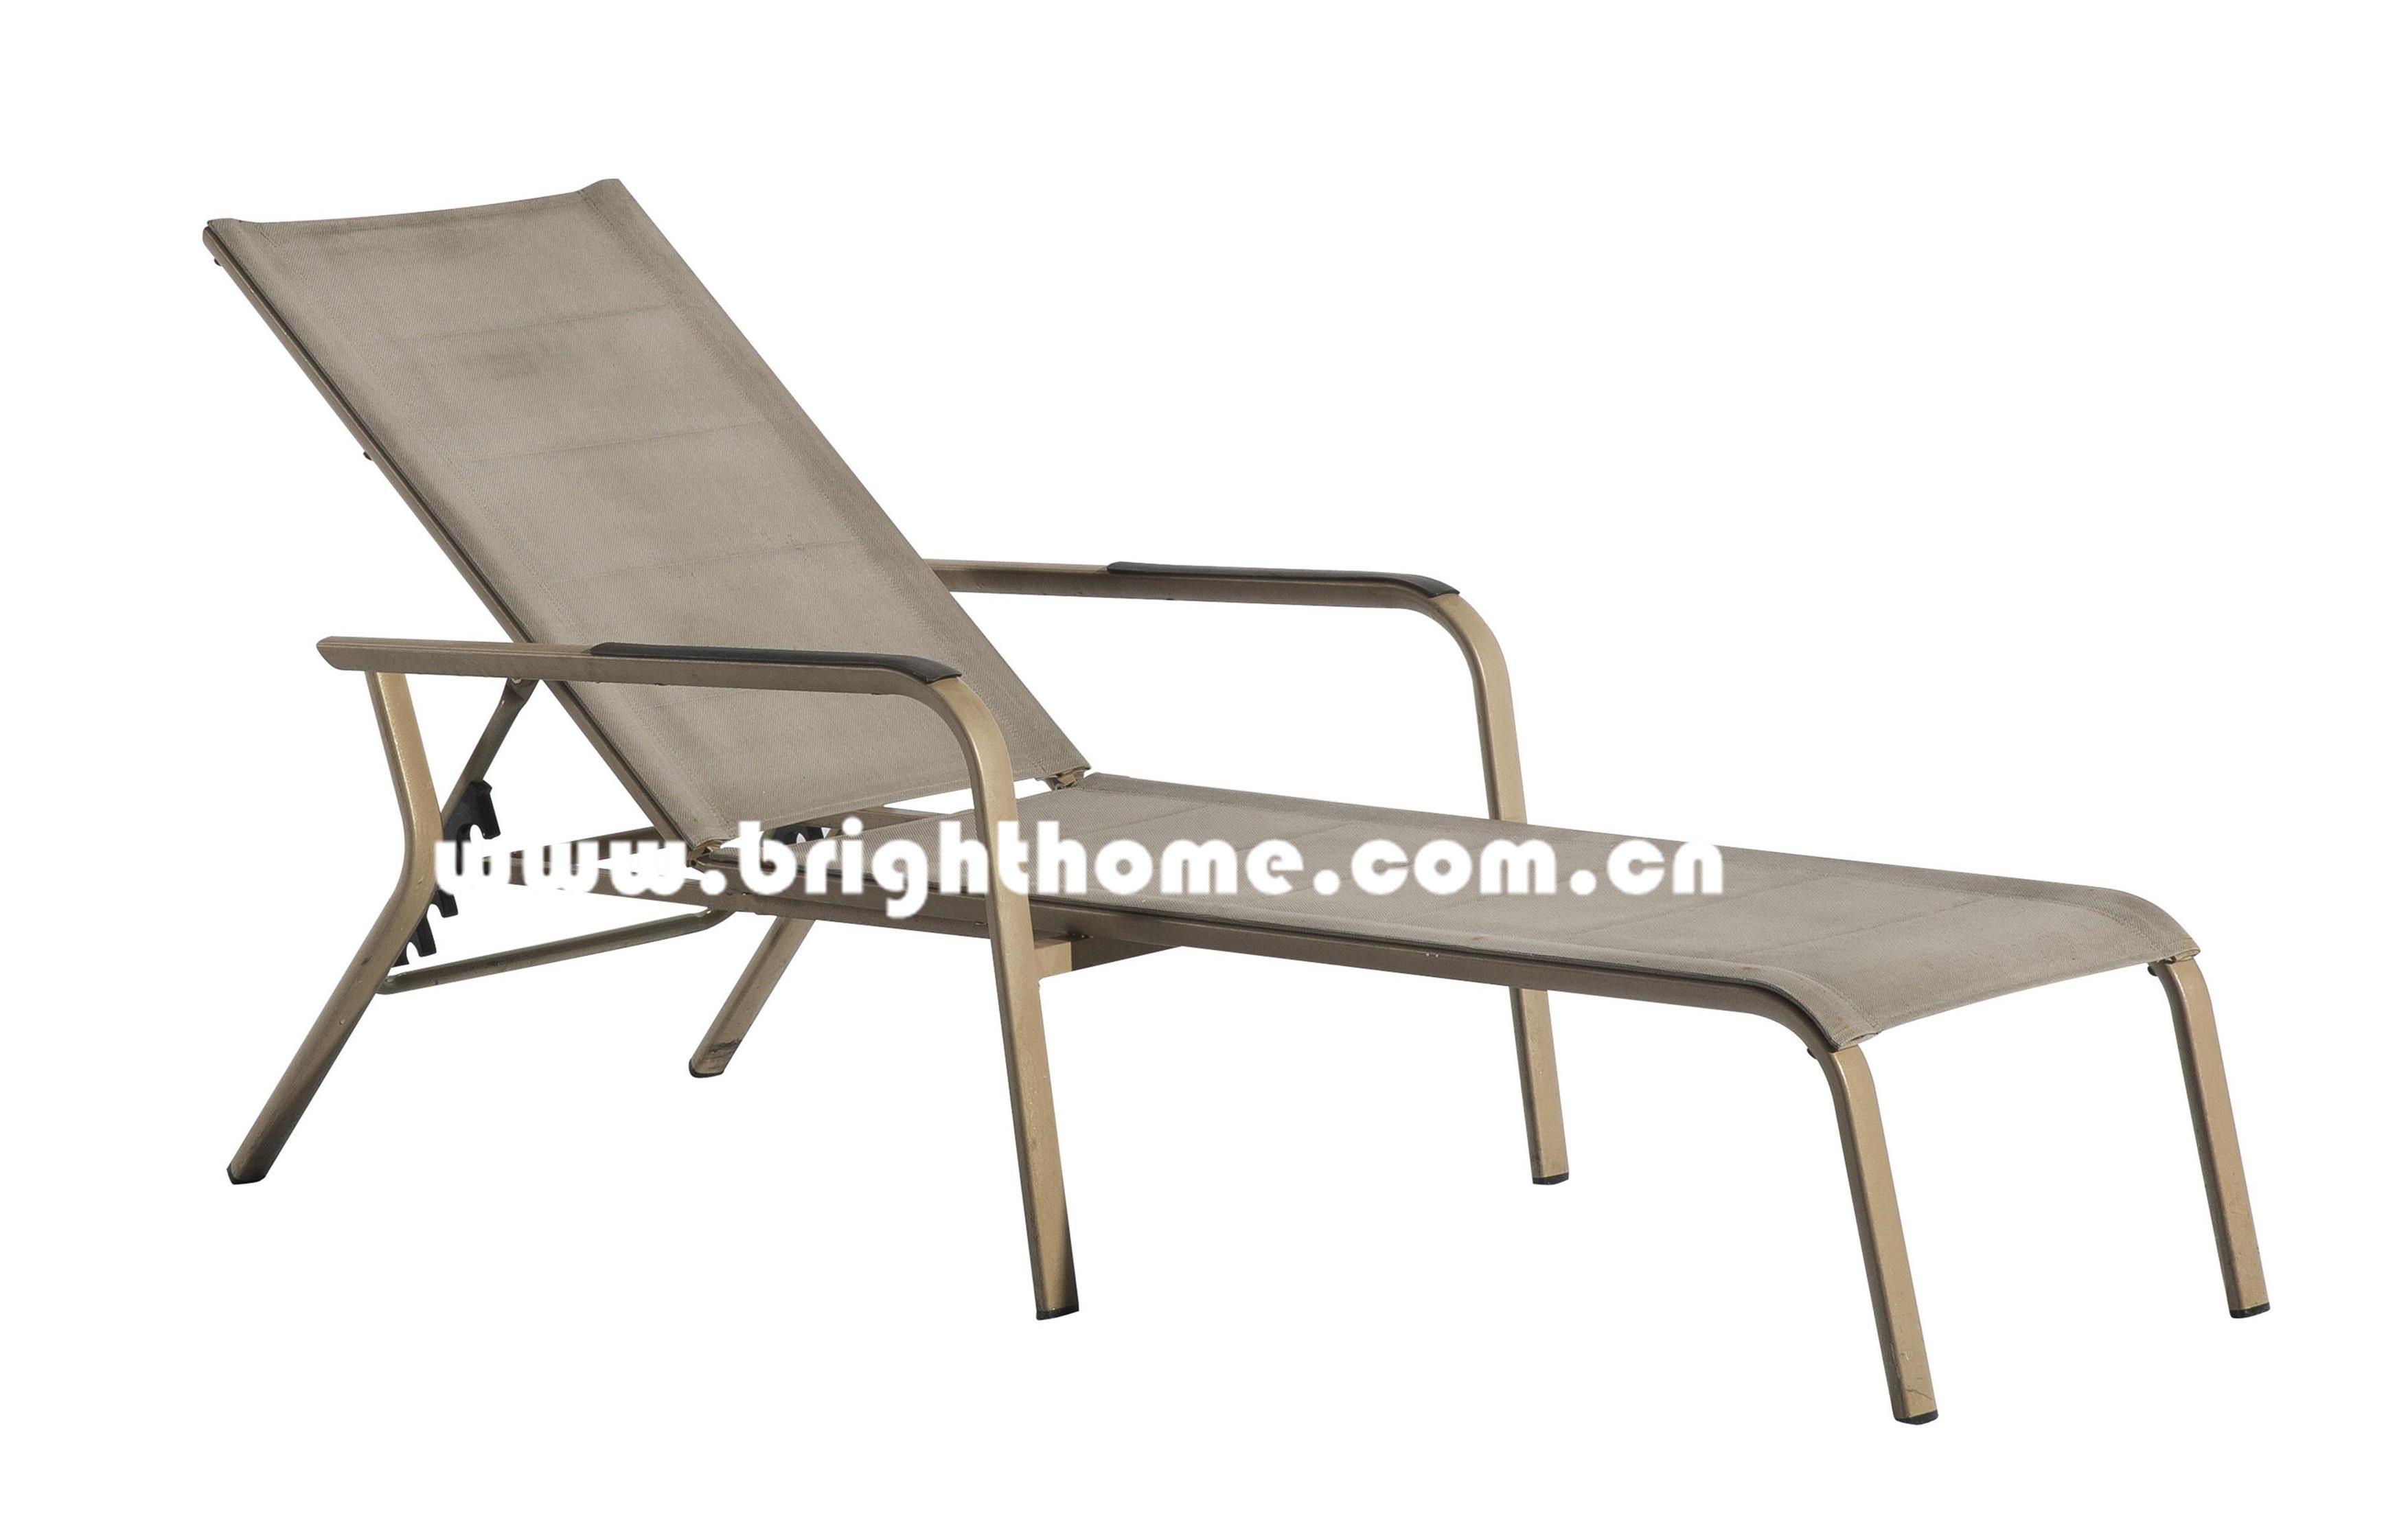 Aluminum Sun Lounger/Chaise Bed/Beach Chair